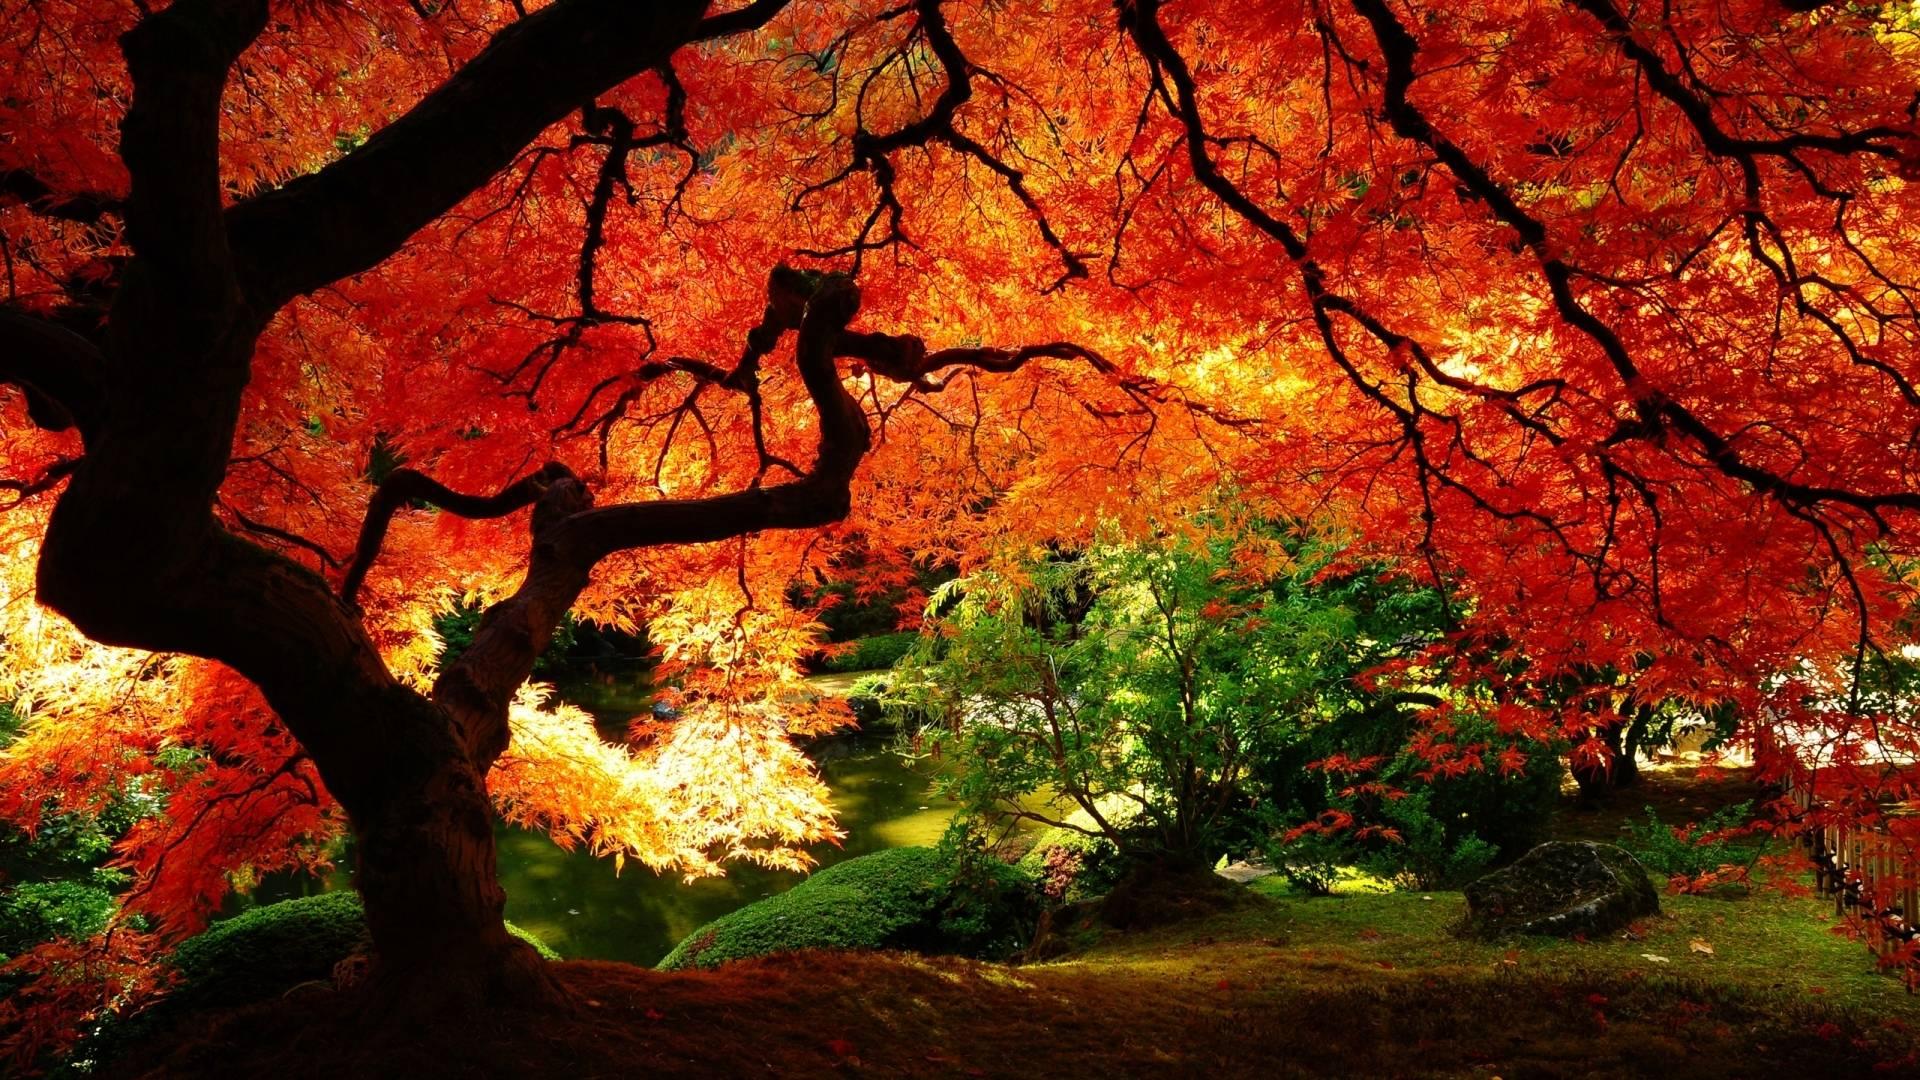 Fall scenes wallpapers wallpaper cave - Pics of fall scenes ...